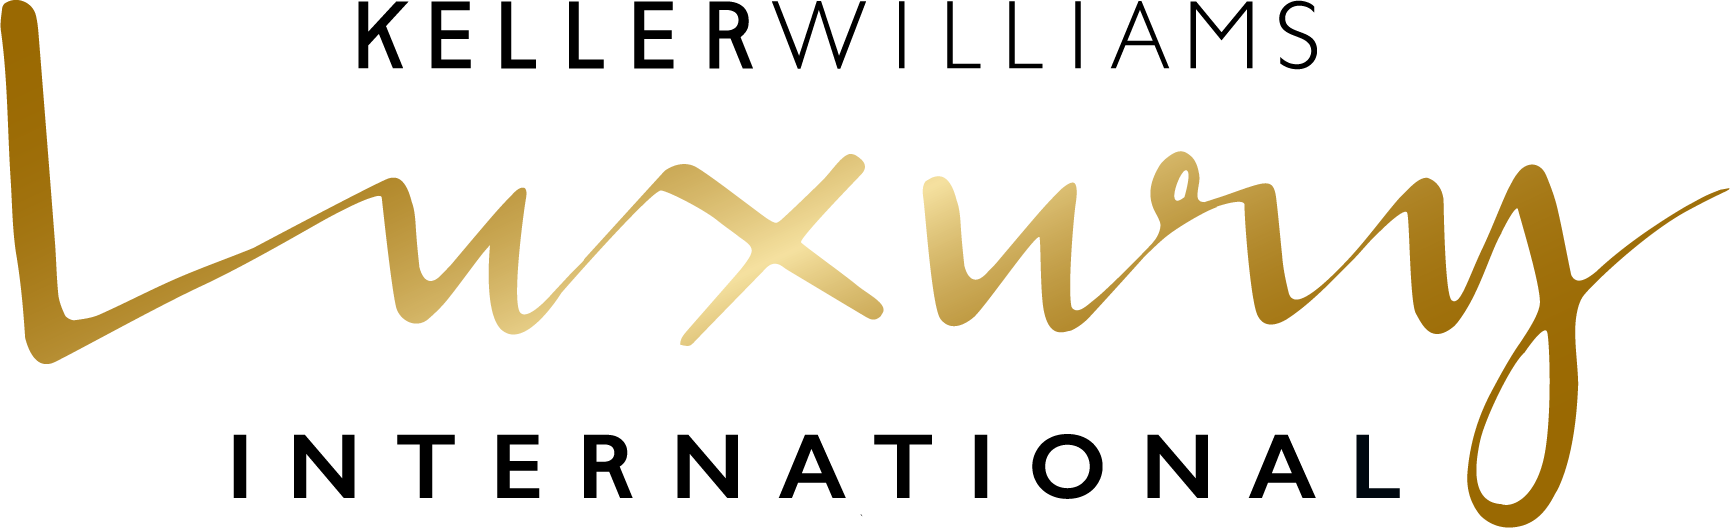 kw luxury logo